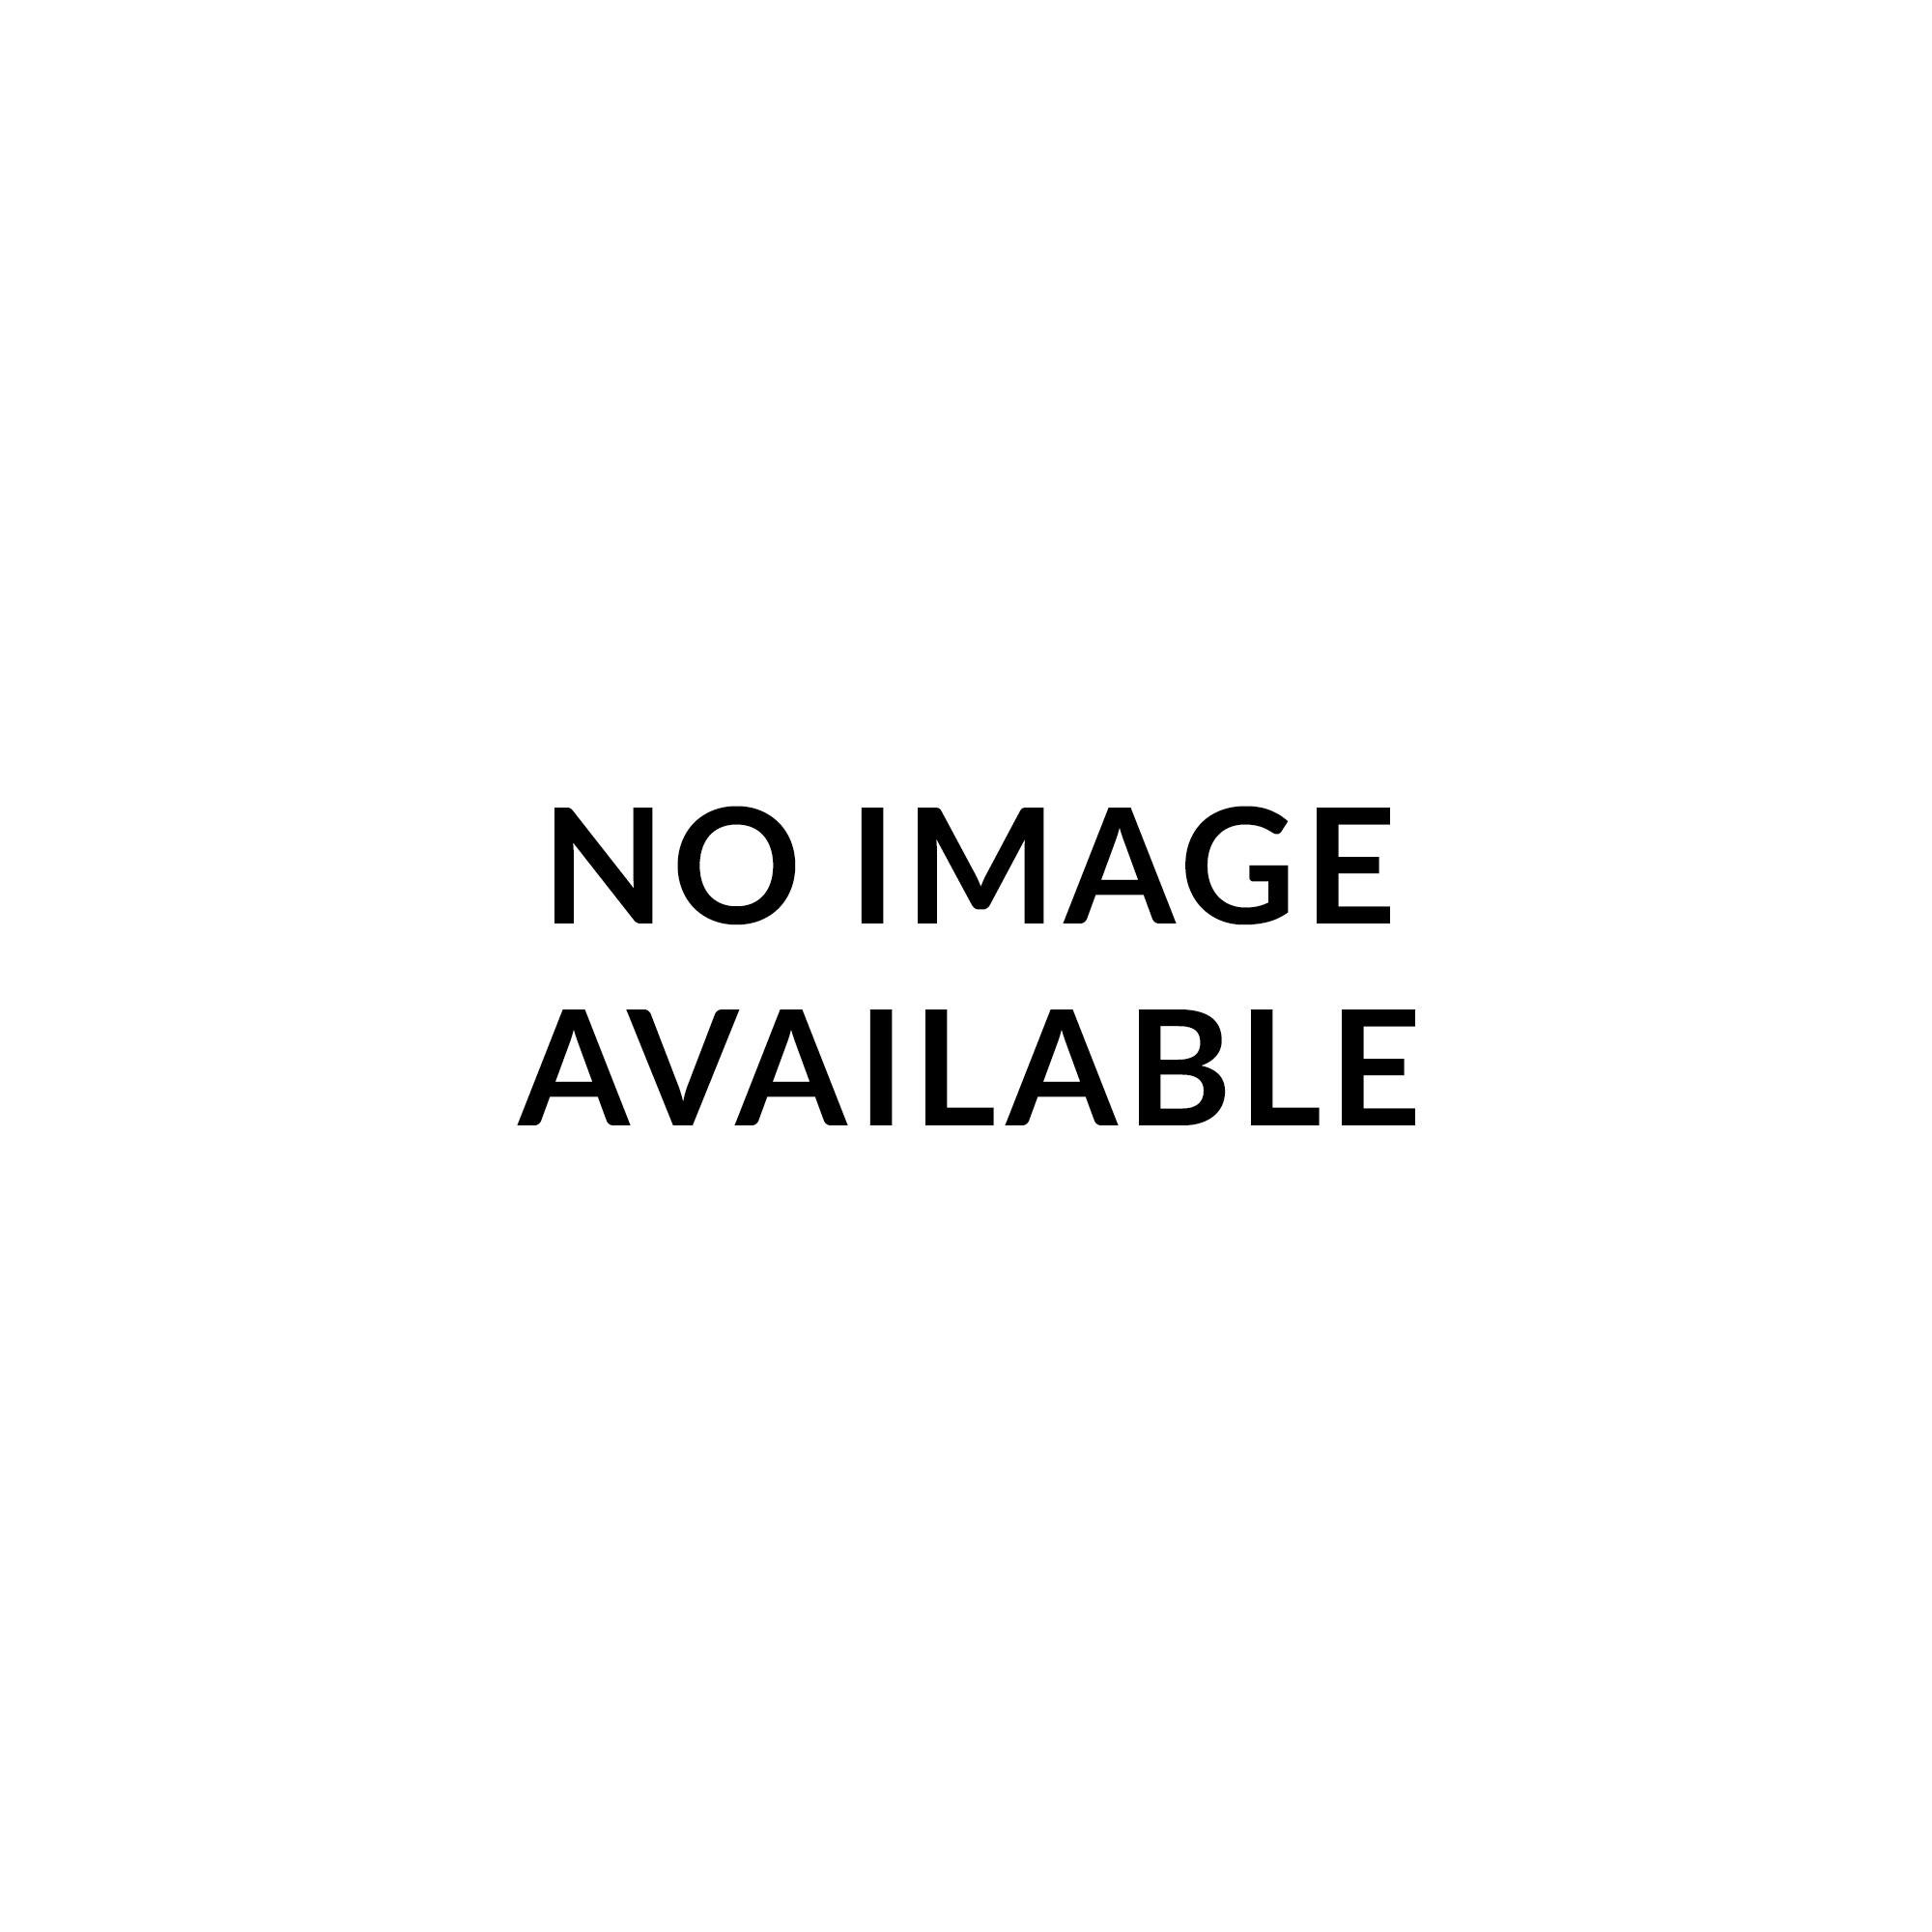 LaBella Hard Rockin Steel Series 10-46 Regular